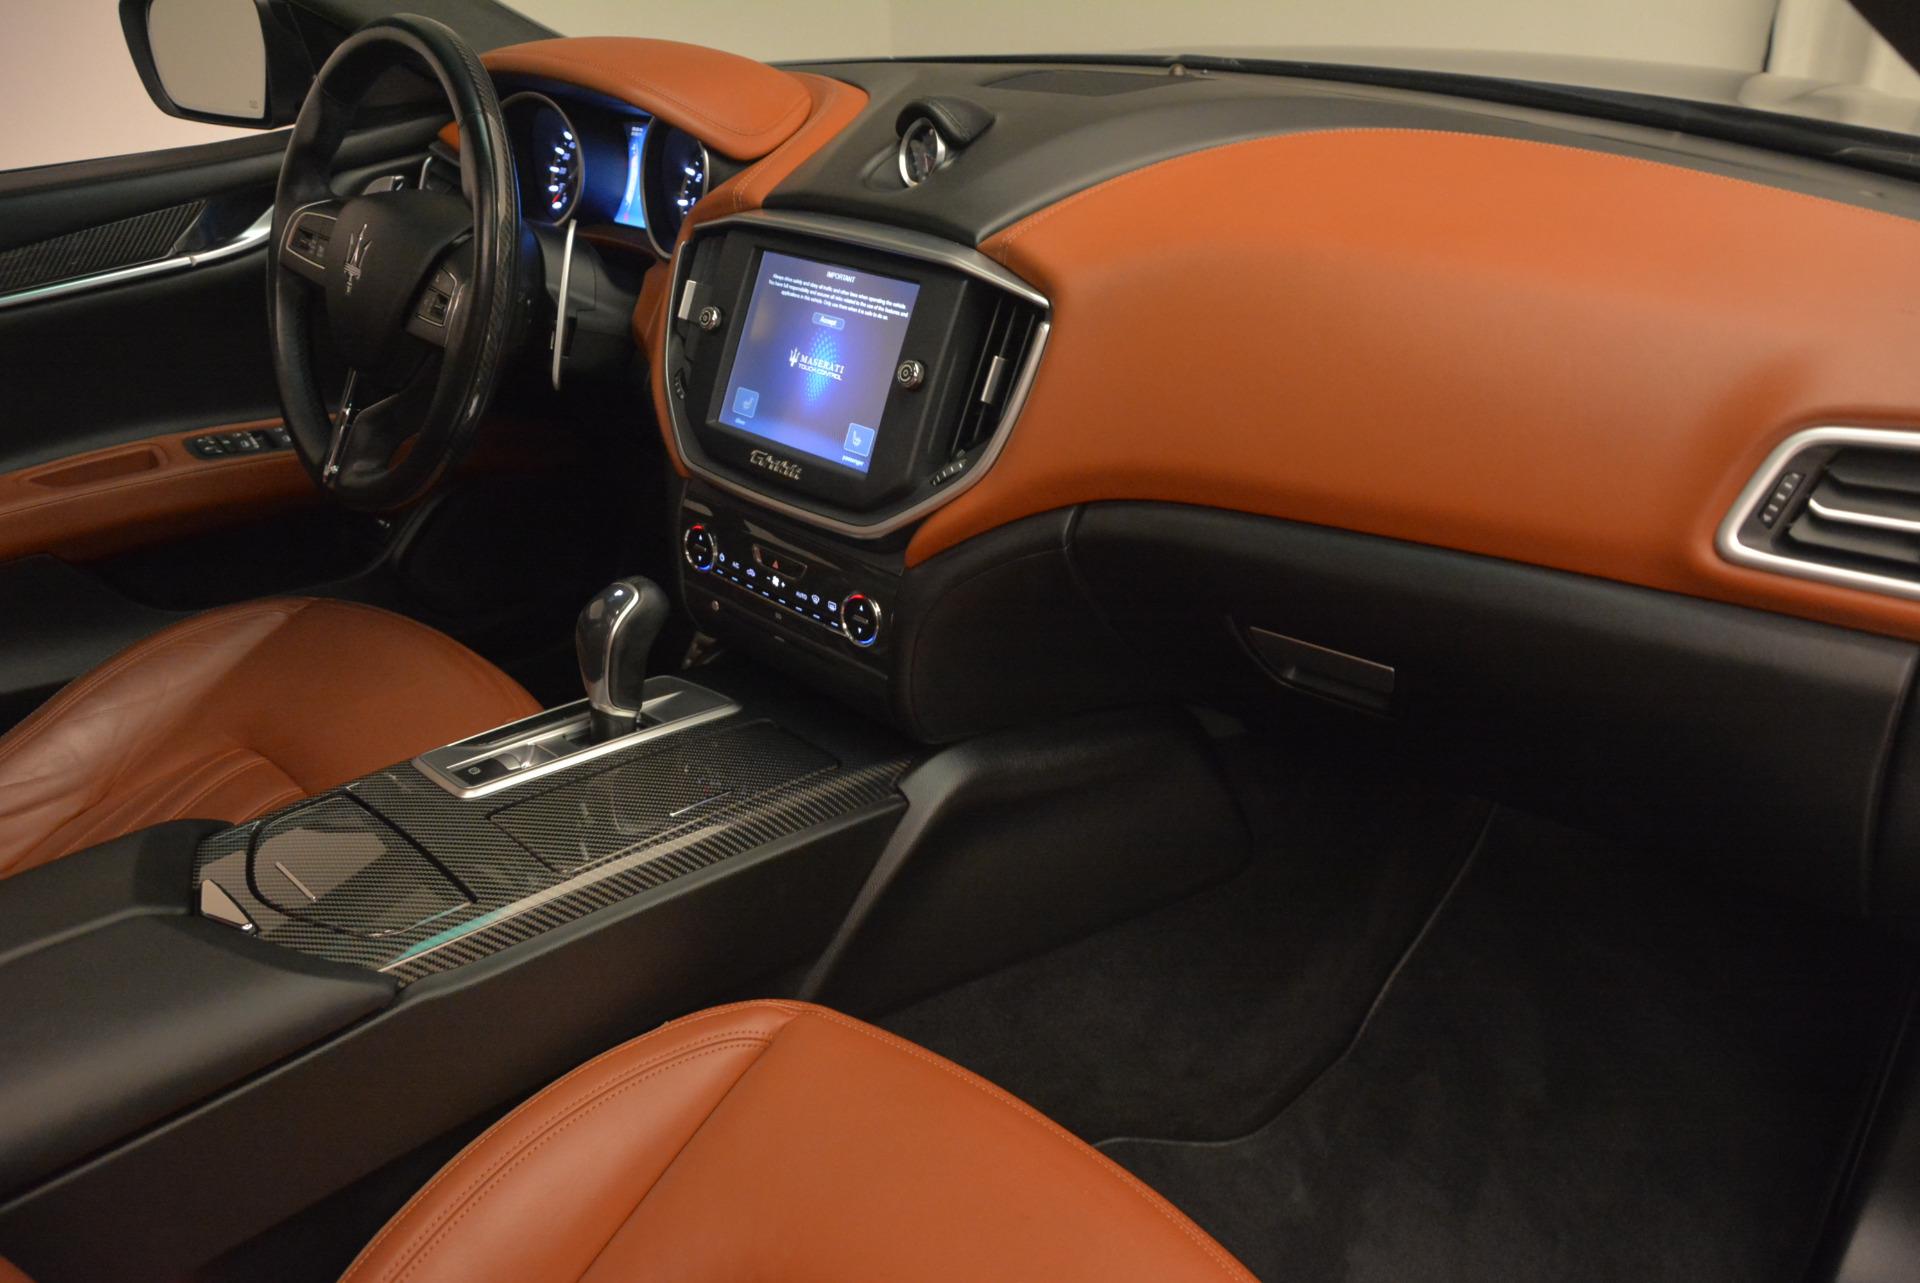 Used 2014 Maserati Ghibli S Q4 For Sale In Greenwich, CT 805_p20